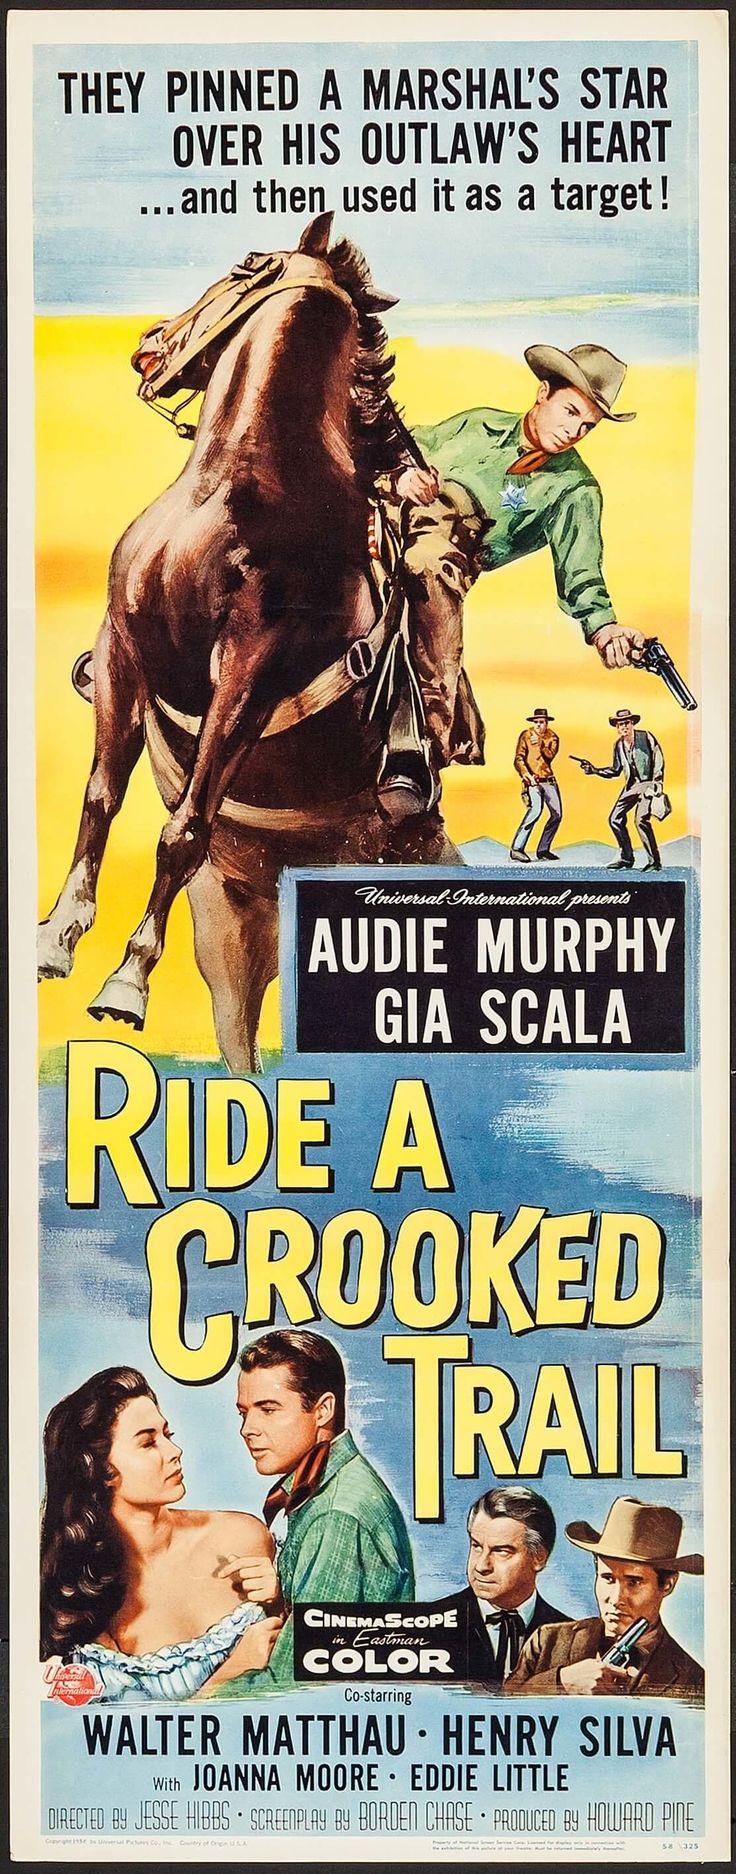 Ride a Crooked Trail (1958) Stars: Audie Murphy, Gia Scala, Walter Matthau, Henry Silva, Joanna Moore ~ Director: Jesse Hibbs